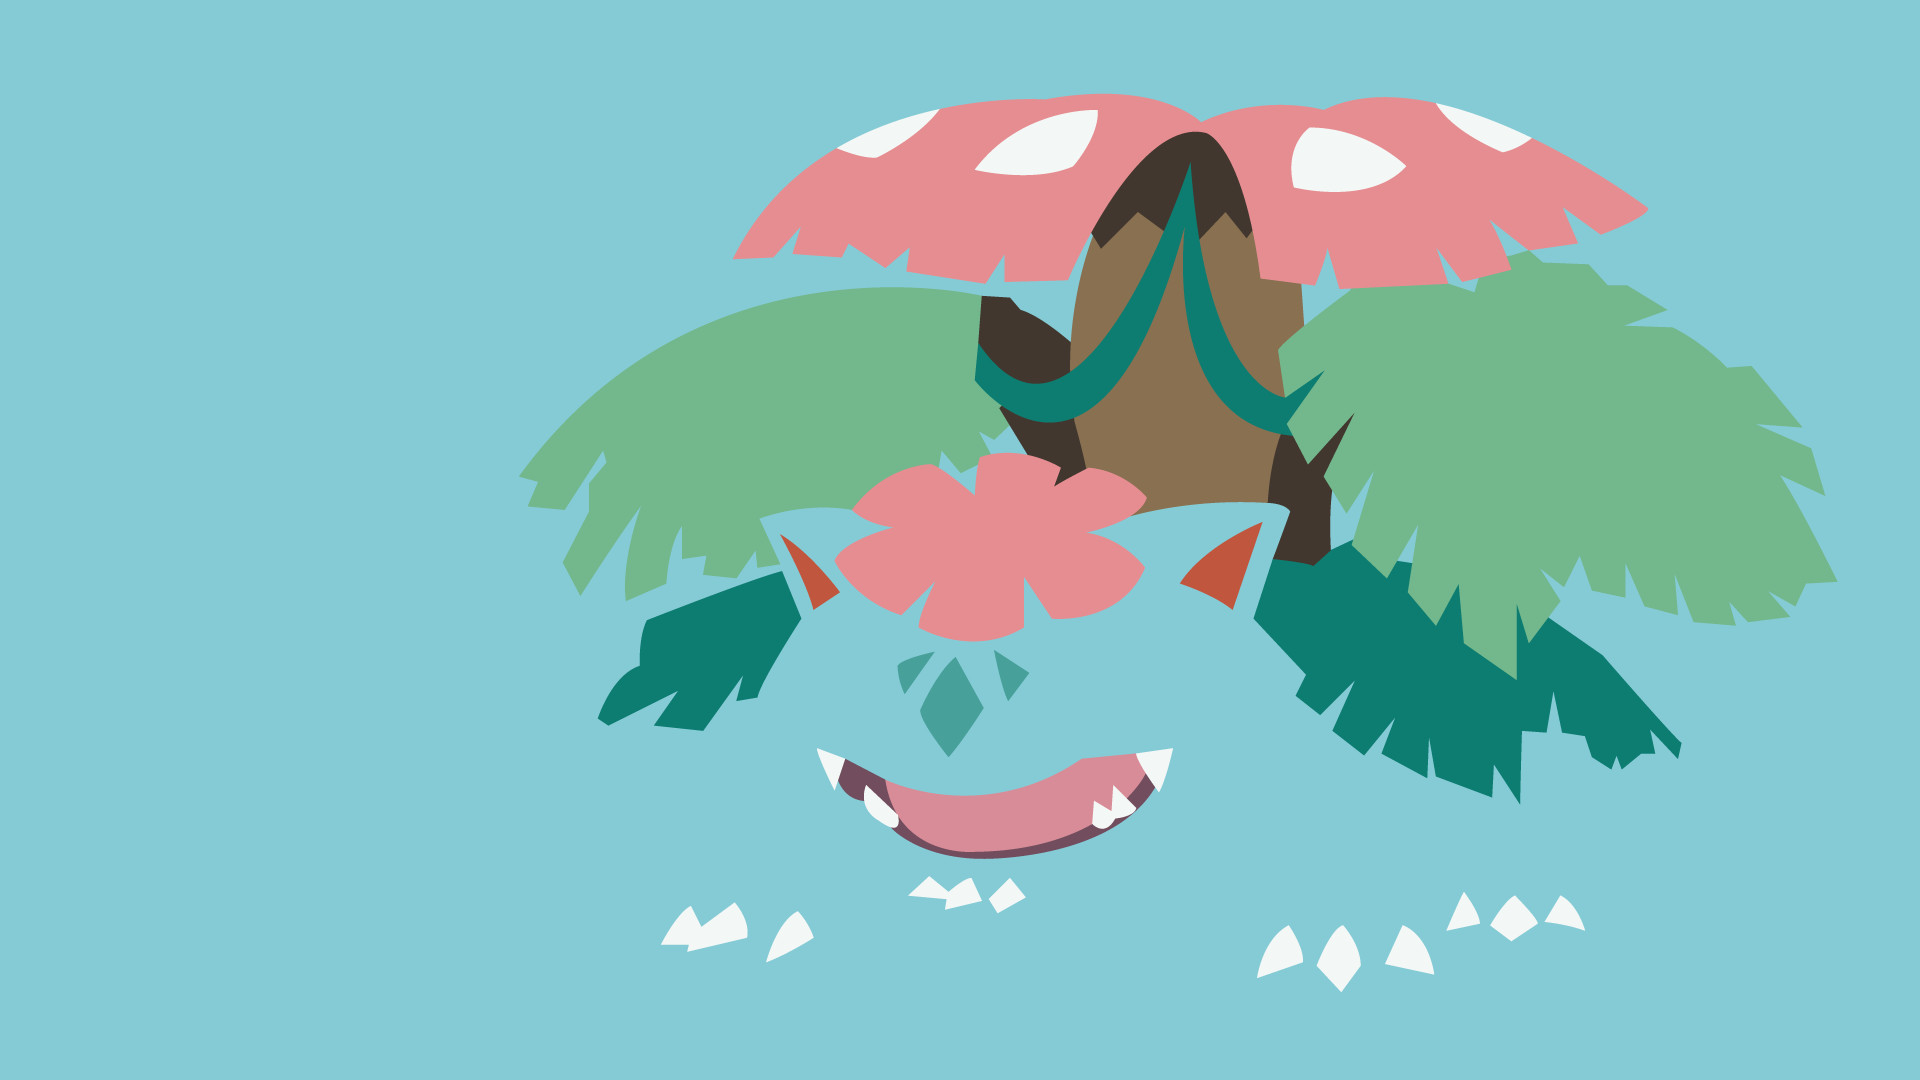 151 Pokémon Wallpapers + Mega Evolutions + Some Shinies